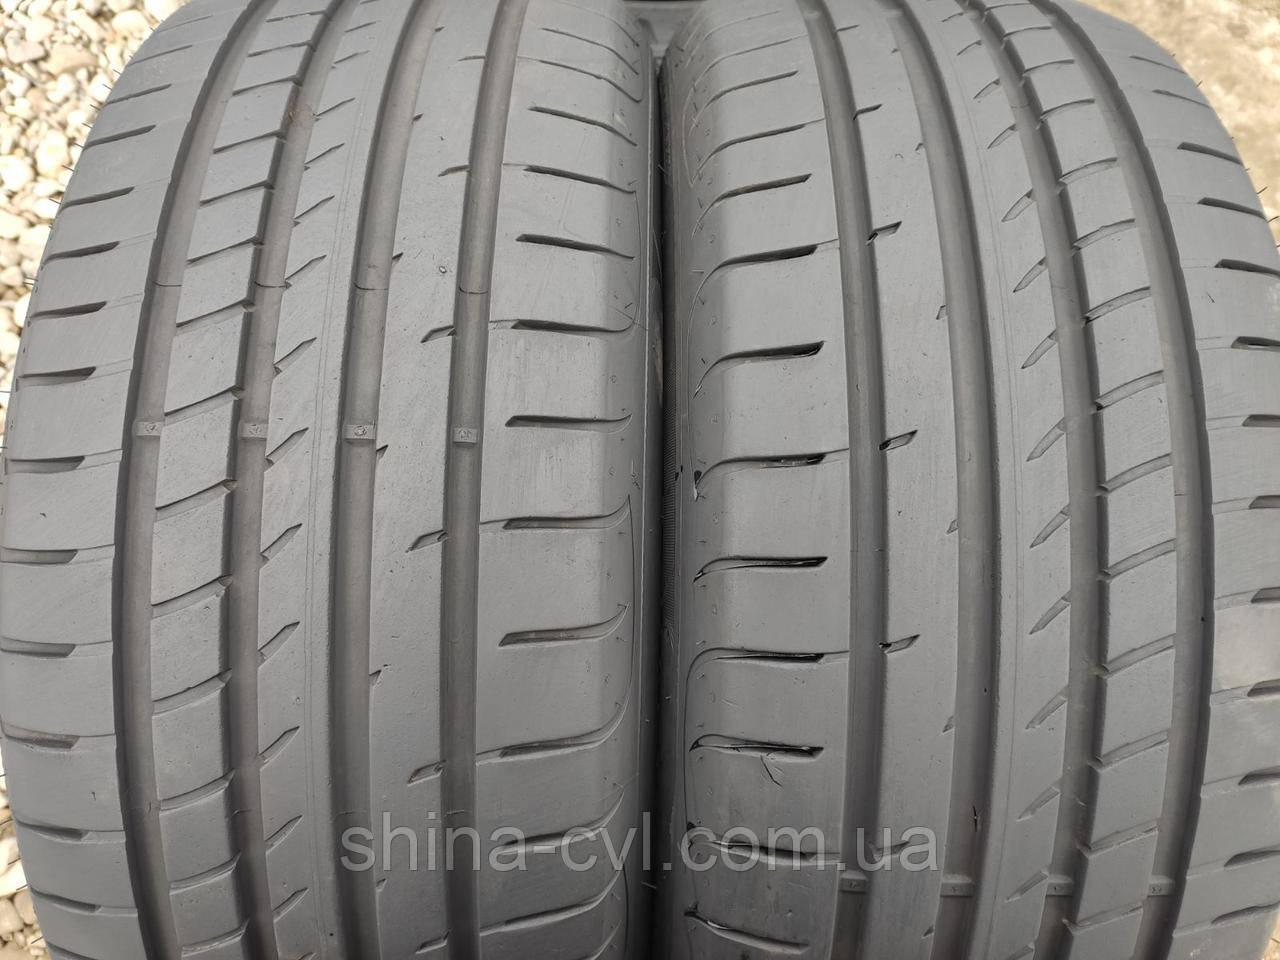 Літні шини 235/55 R17 99Y Goodyear Eagle F1 Asymmetric 2